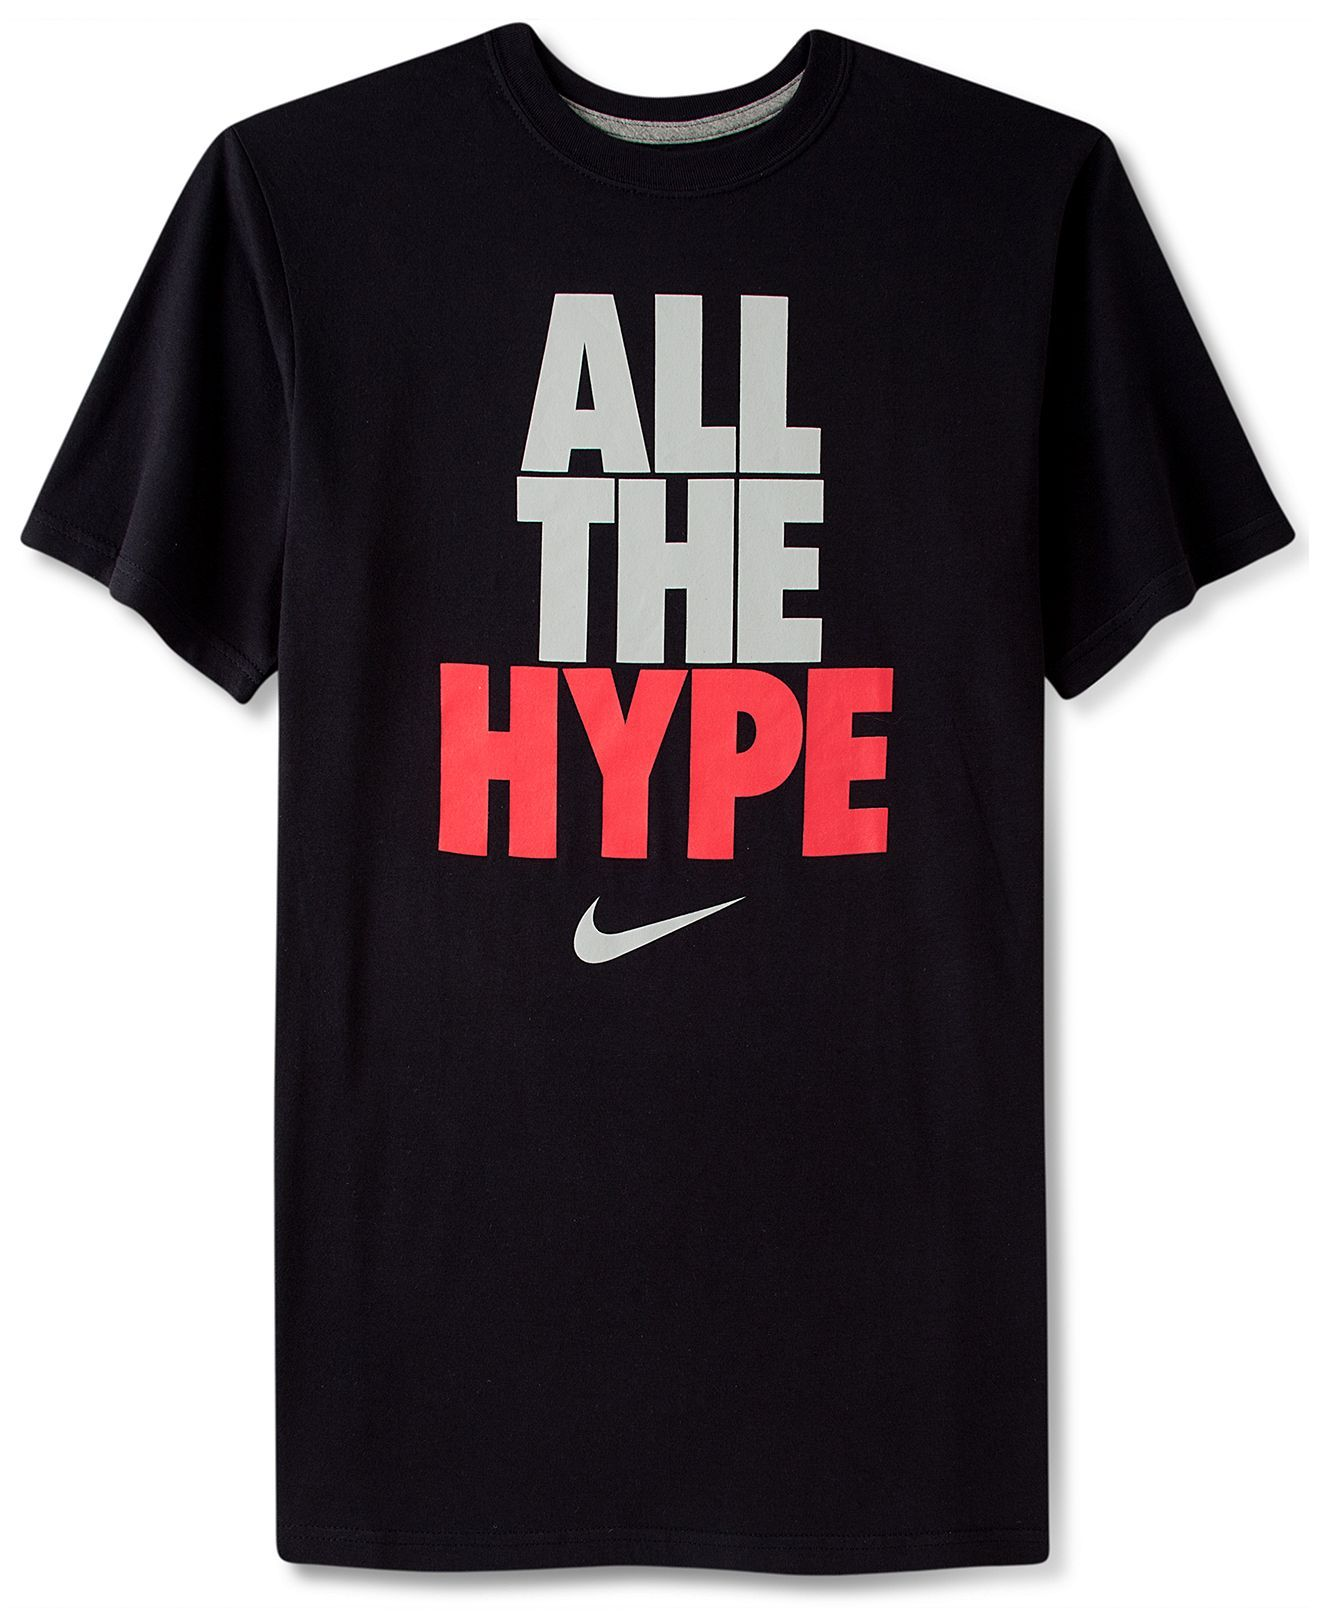 2a0d20cd Nike Shirt, All The Hype T-Shirt - T-Shirts - Men - Macy's | My ...